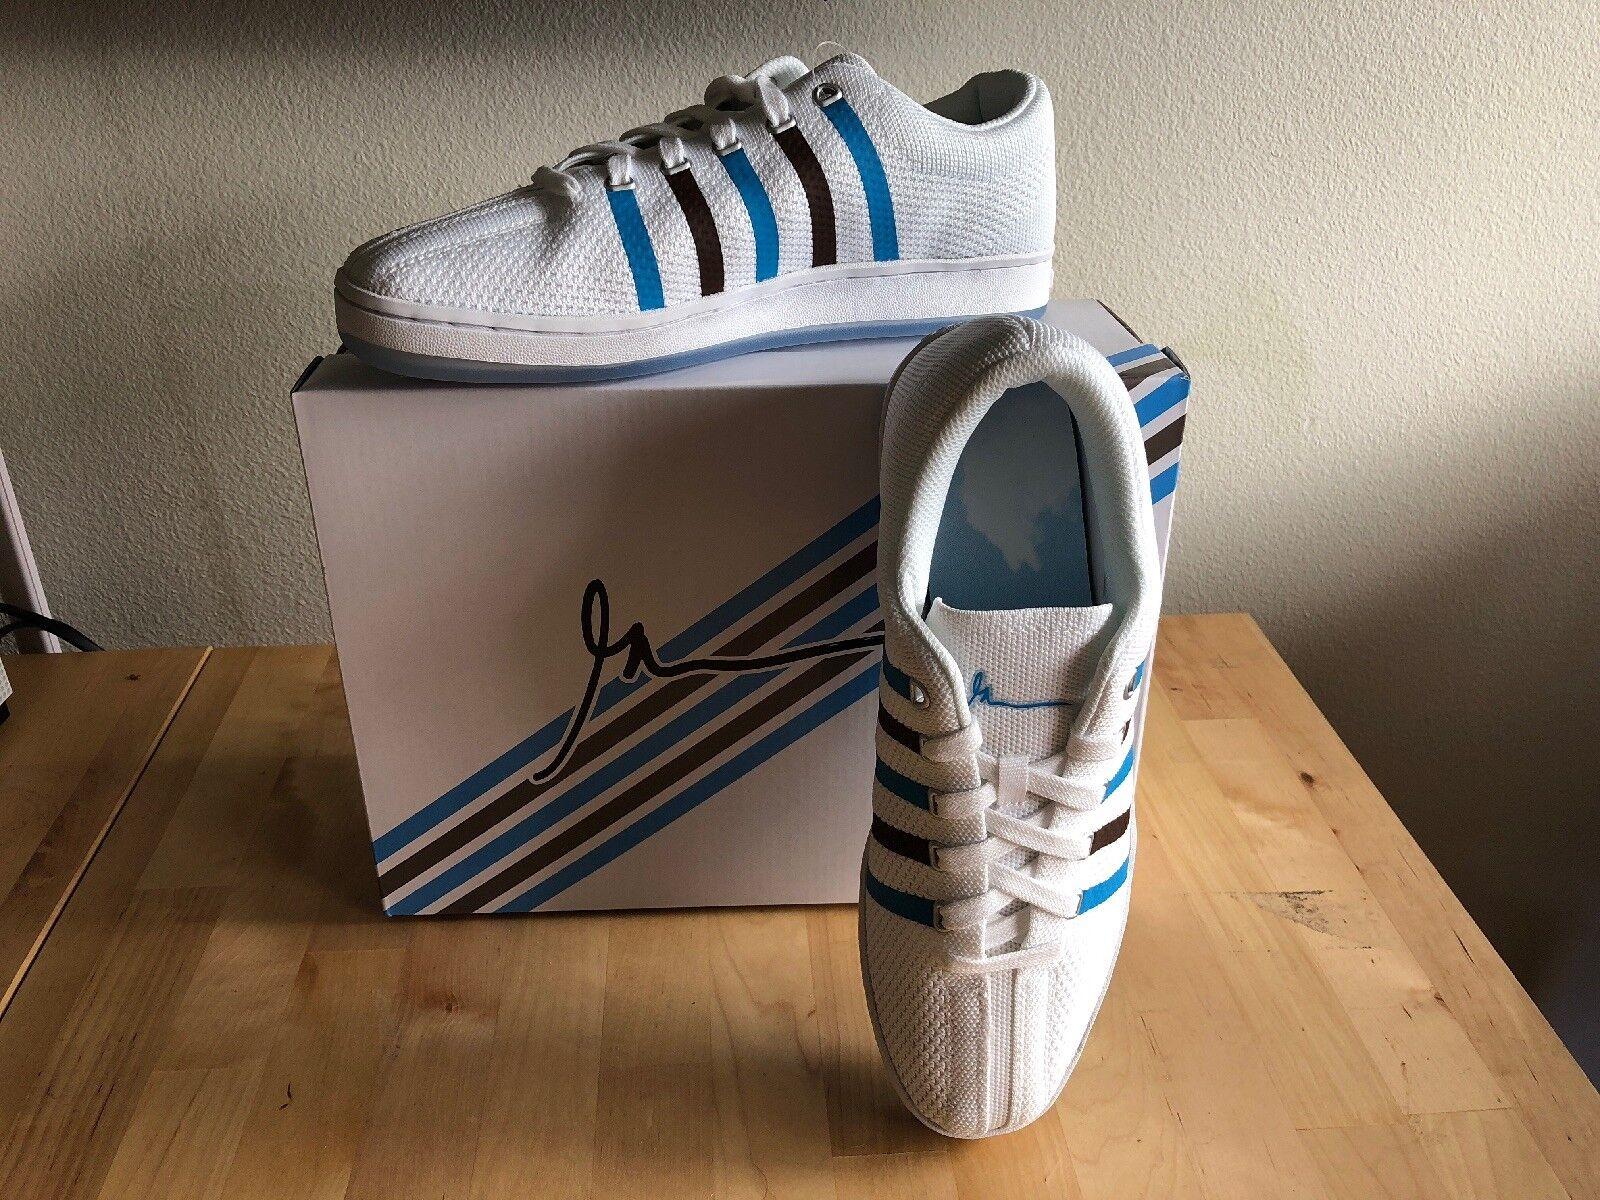 GARY VEE 003 KSWISS 88 KNIT CLOUDS & DIRT Garyvee Sneakers MENS 10 Sold Out!